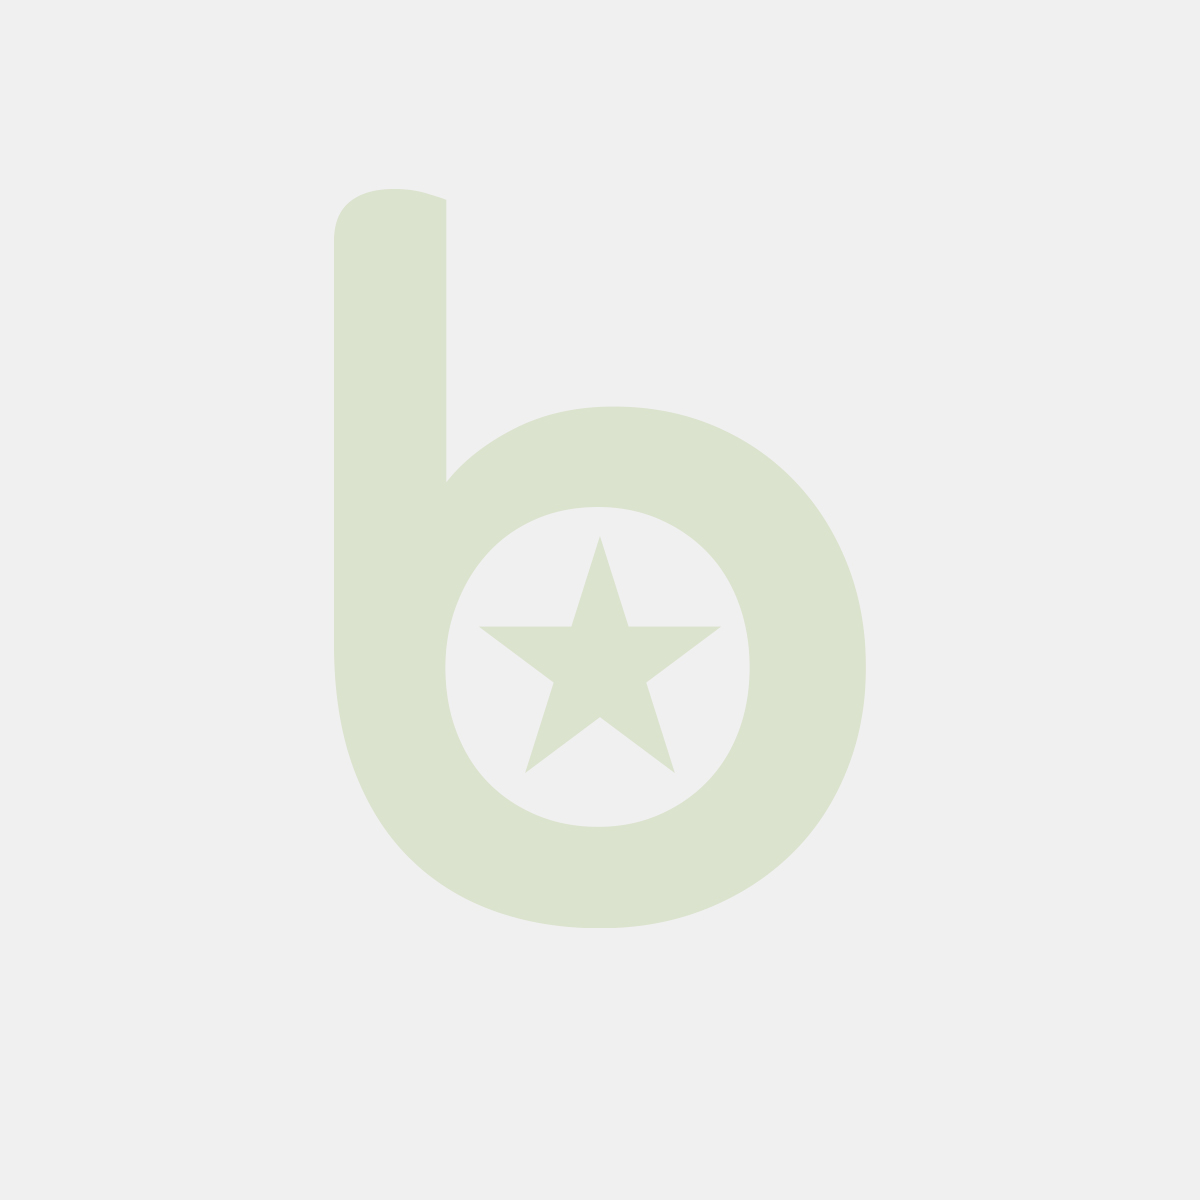 Pojemnik dressingowy, sosjerka PP 50ml B czarna śr.70mm TnP op. 100 sztuk